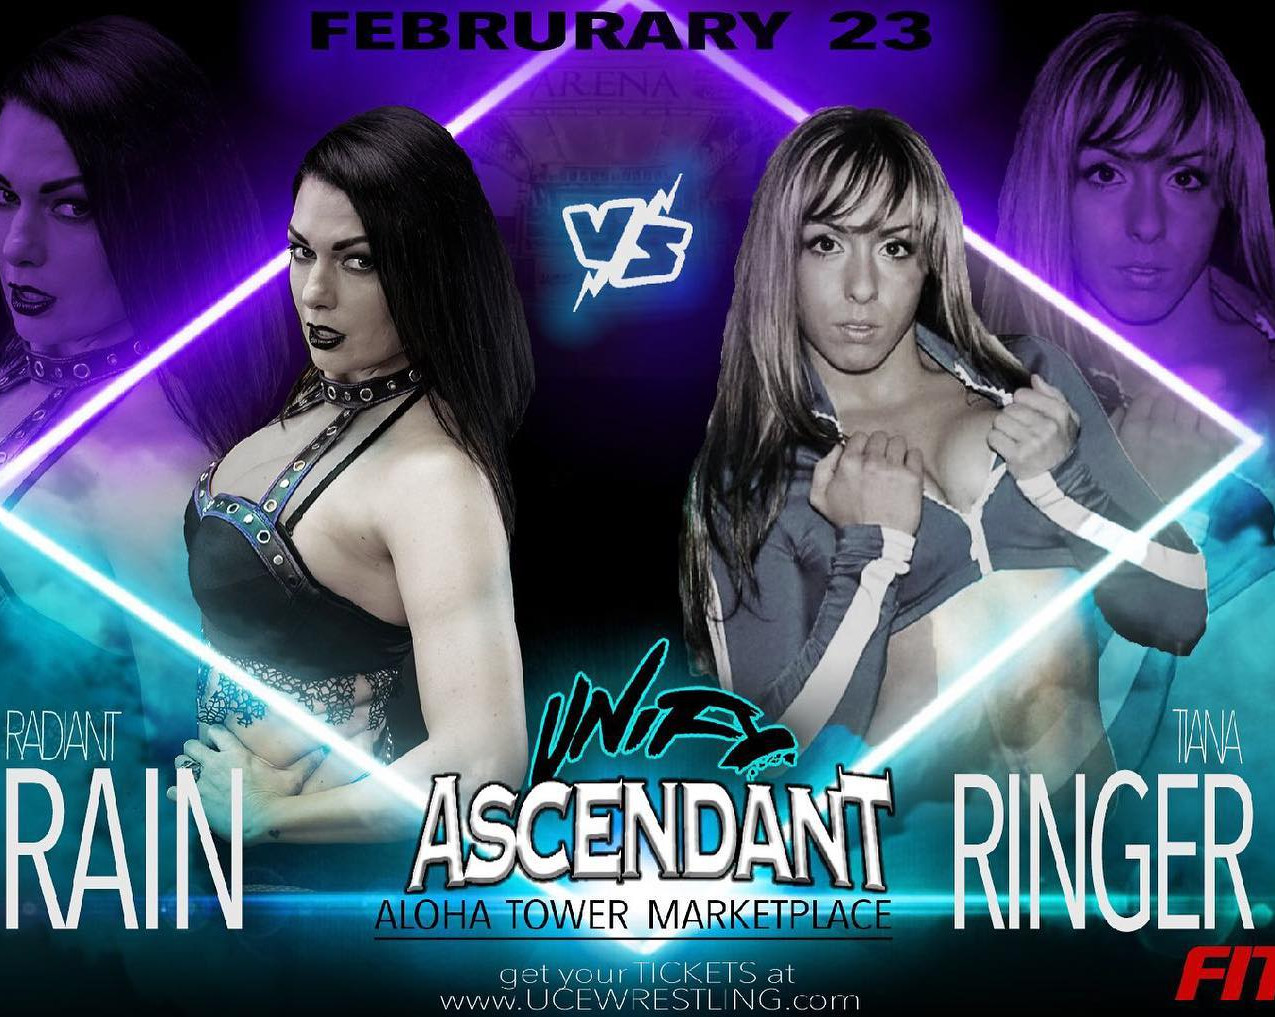 Ascendant - Radiant Rain vs Tiana Ringer